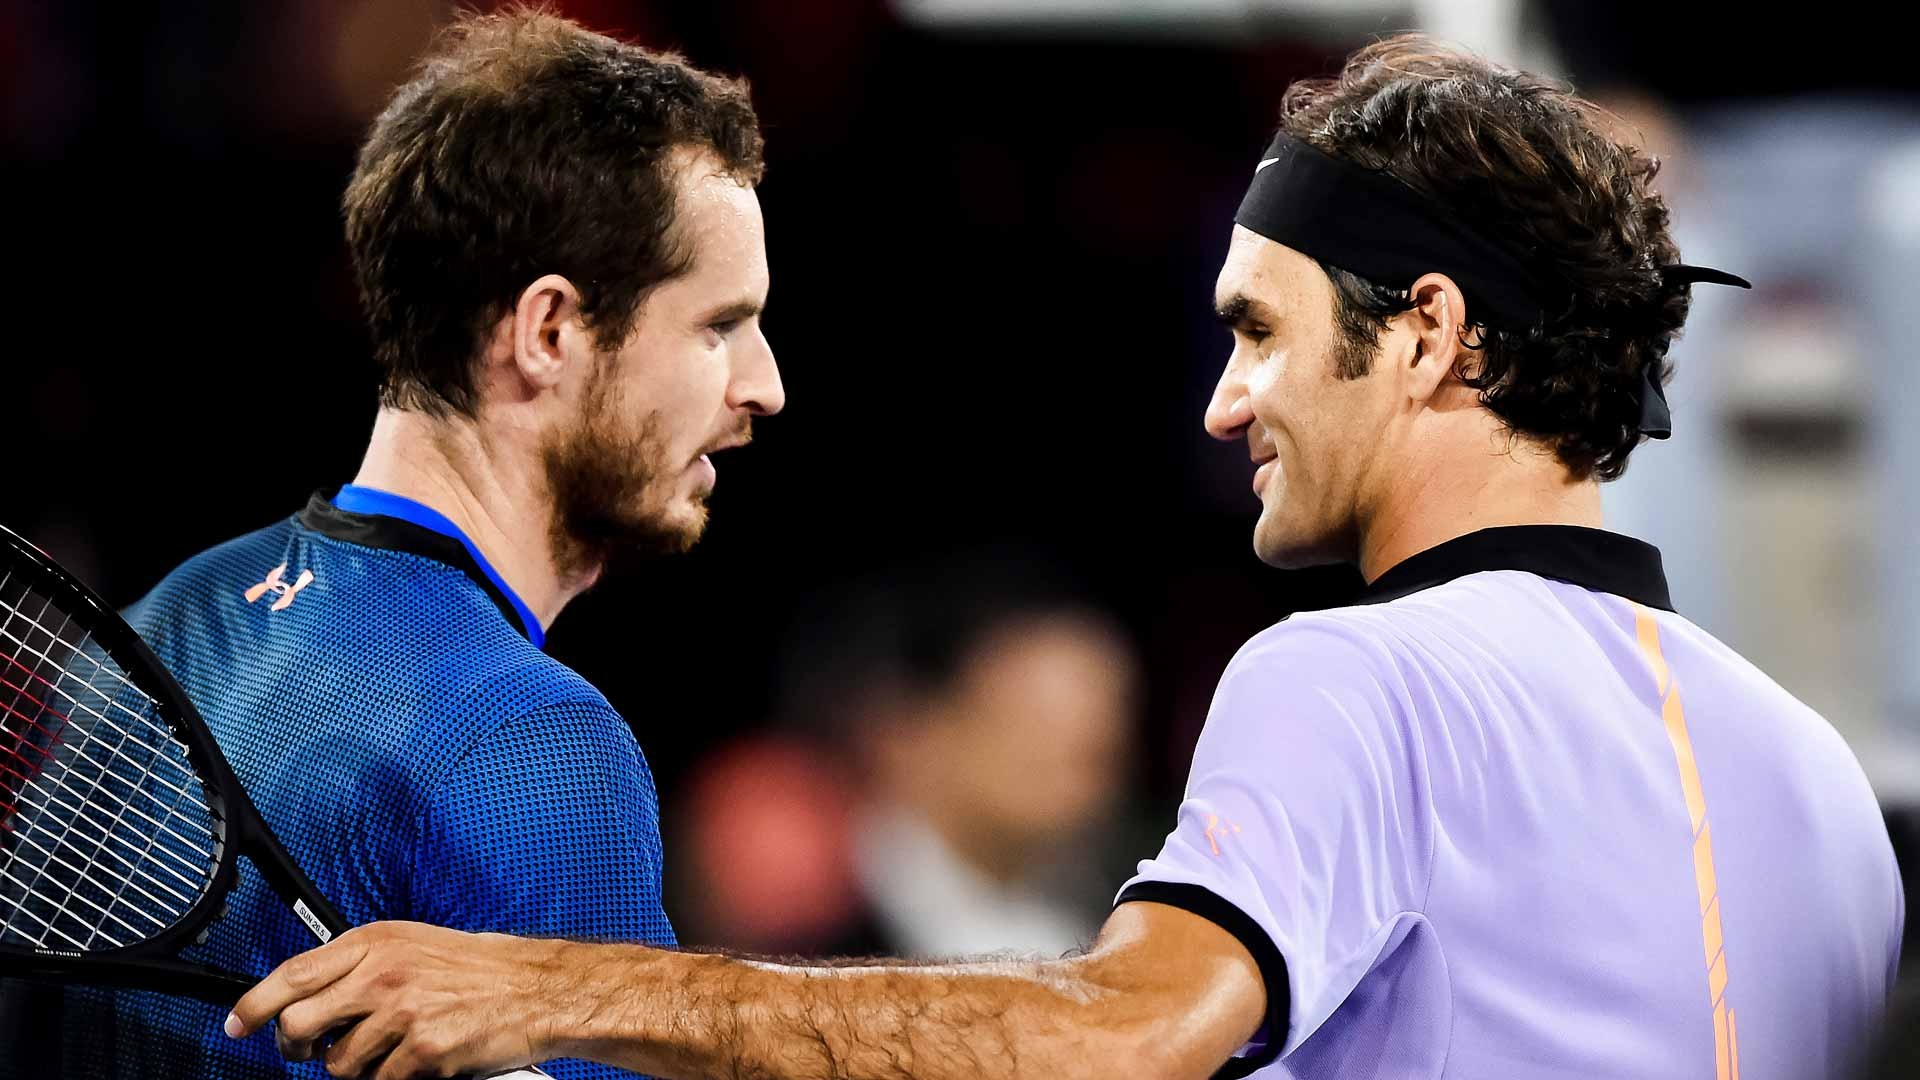 Murray Federer rivalries